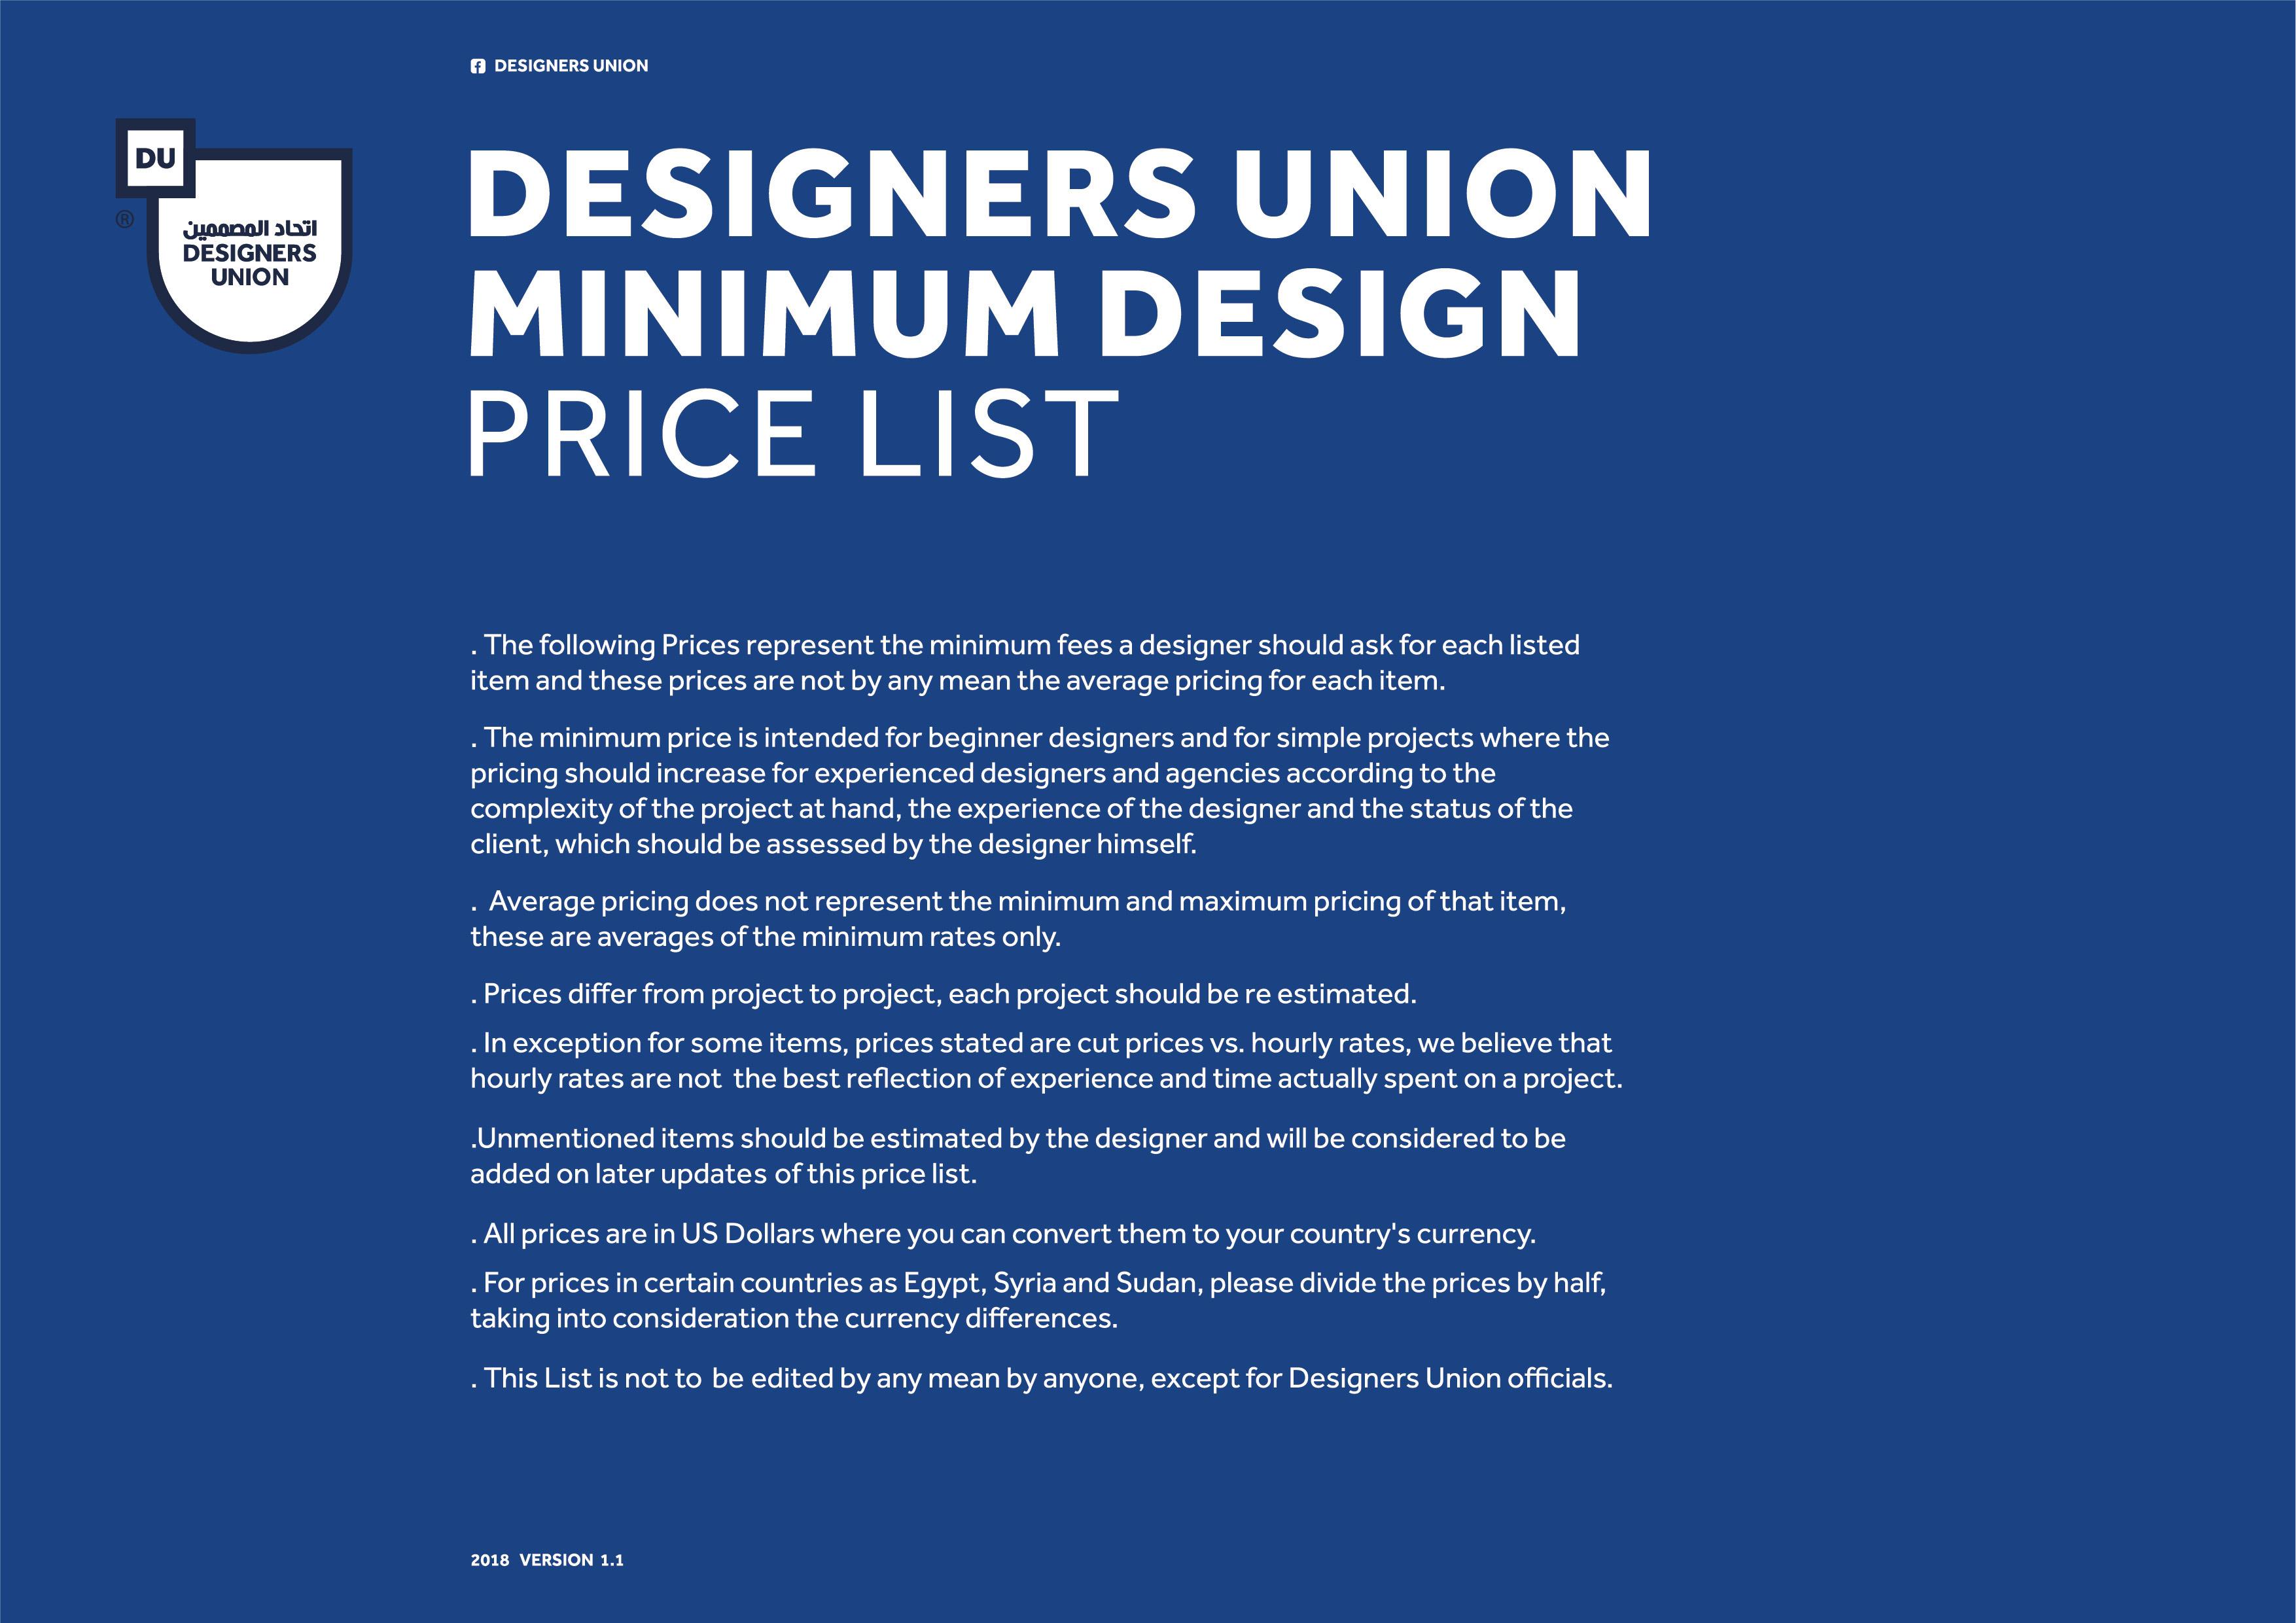 official du design minimum price list on behance